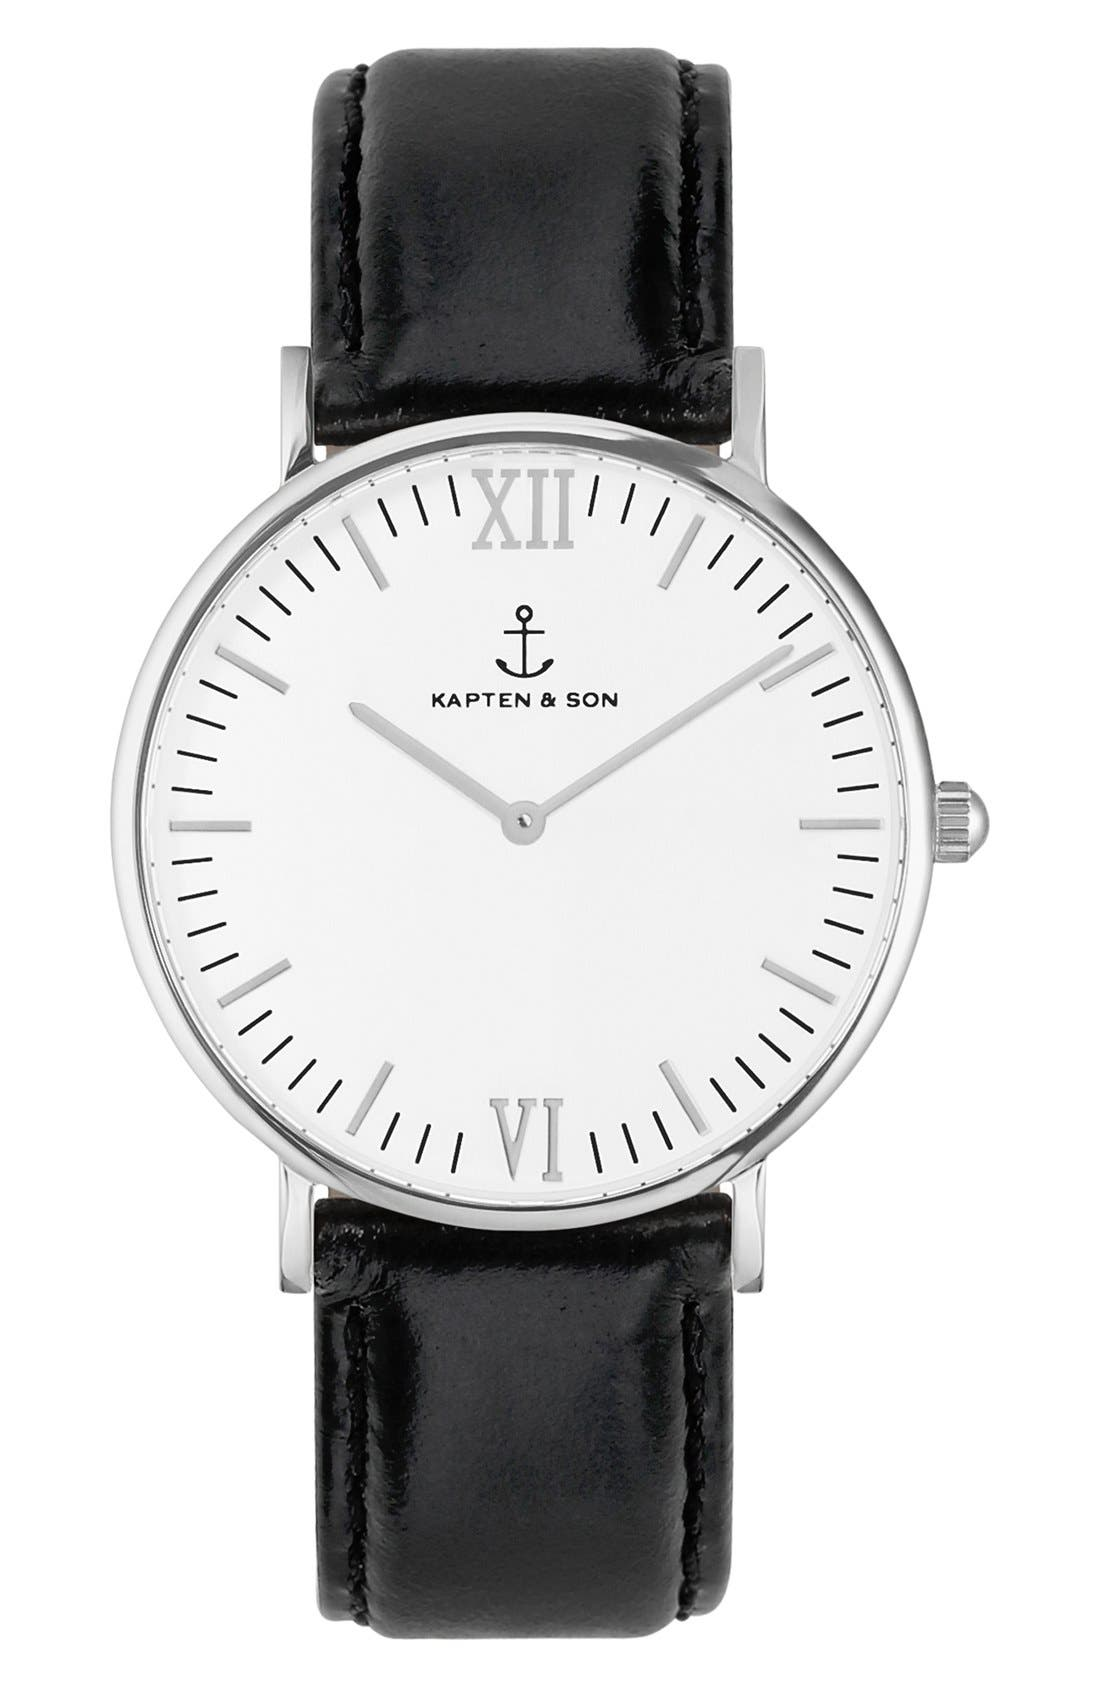 Main Image - Kapten & Son Campus Leather Strap Watch, 40mm